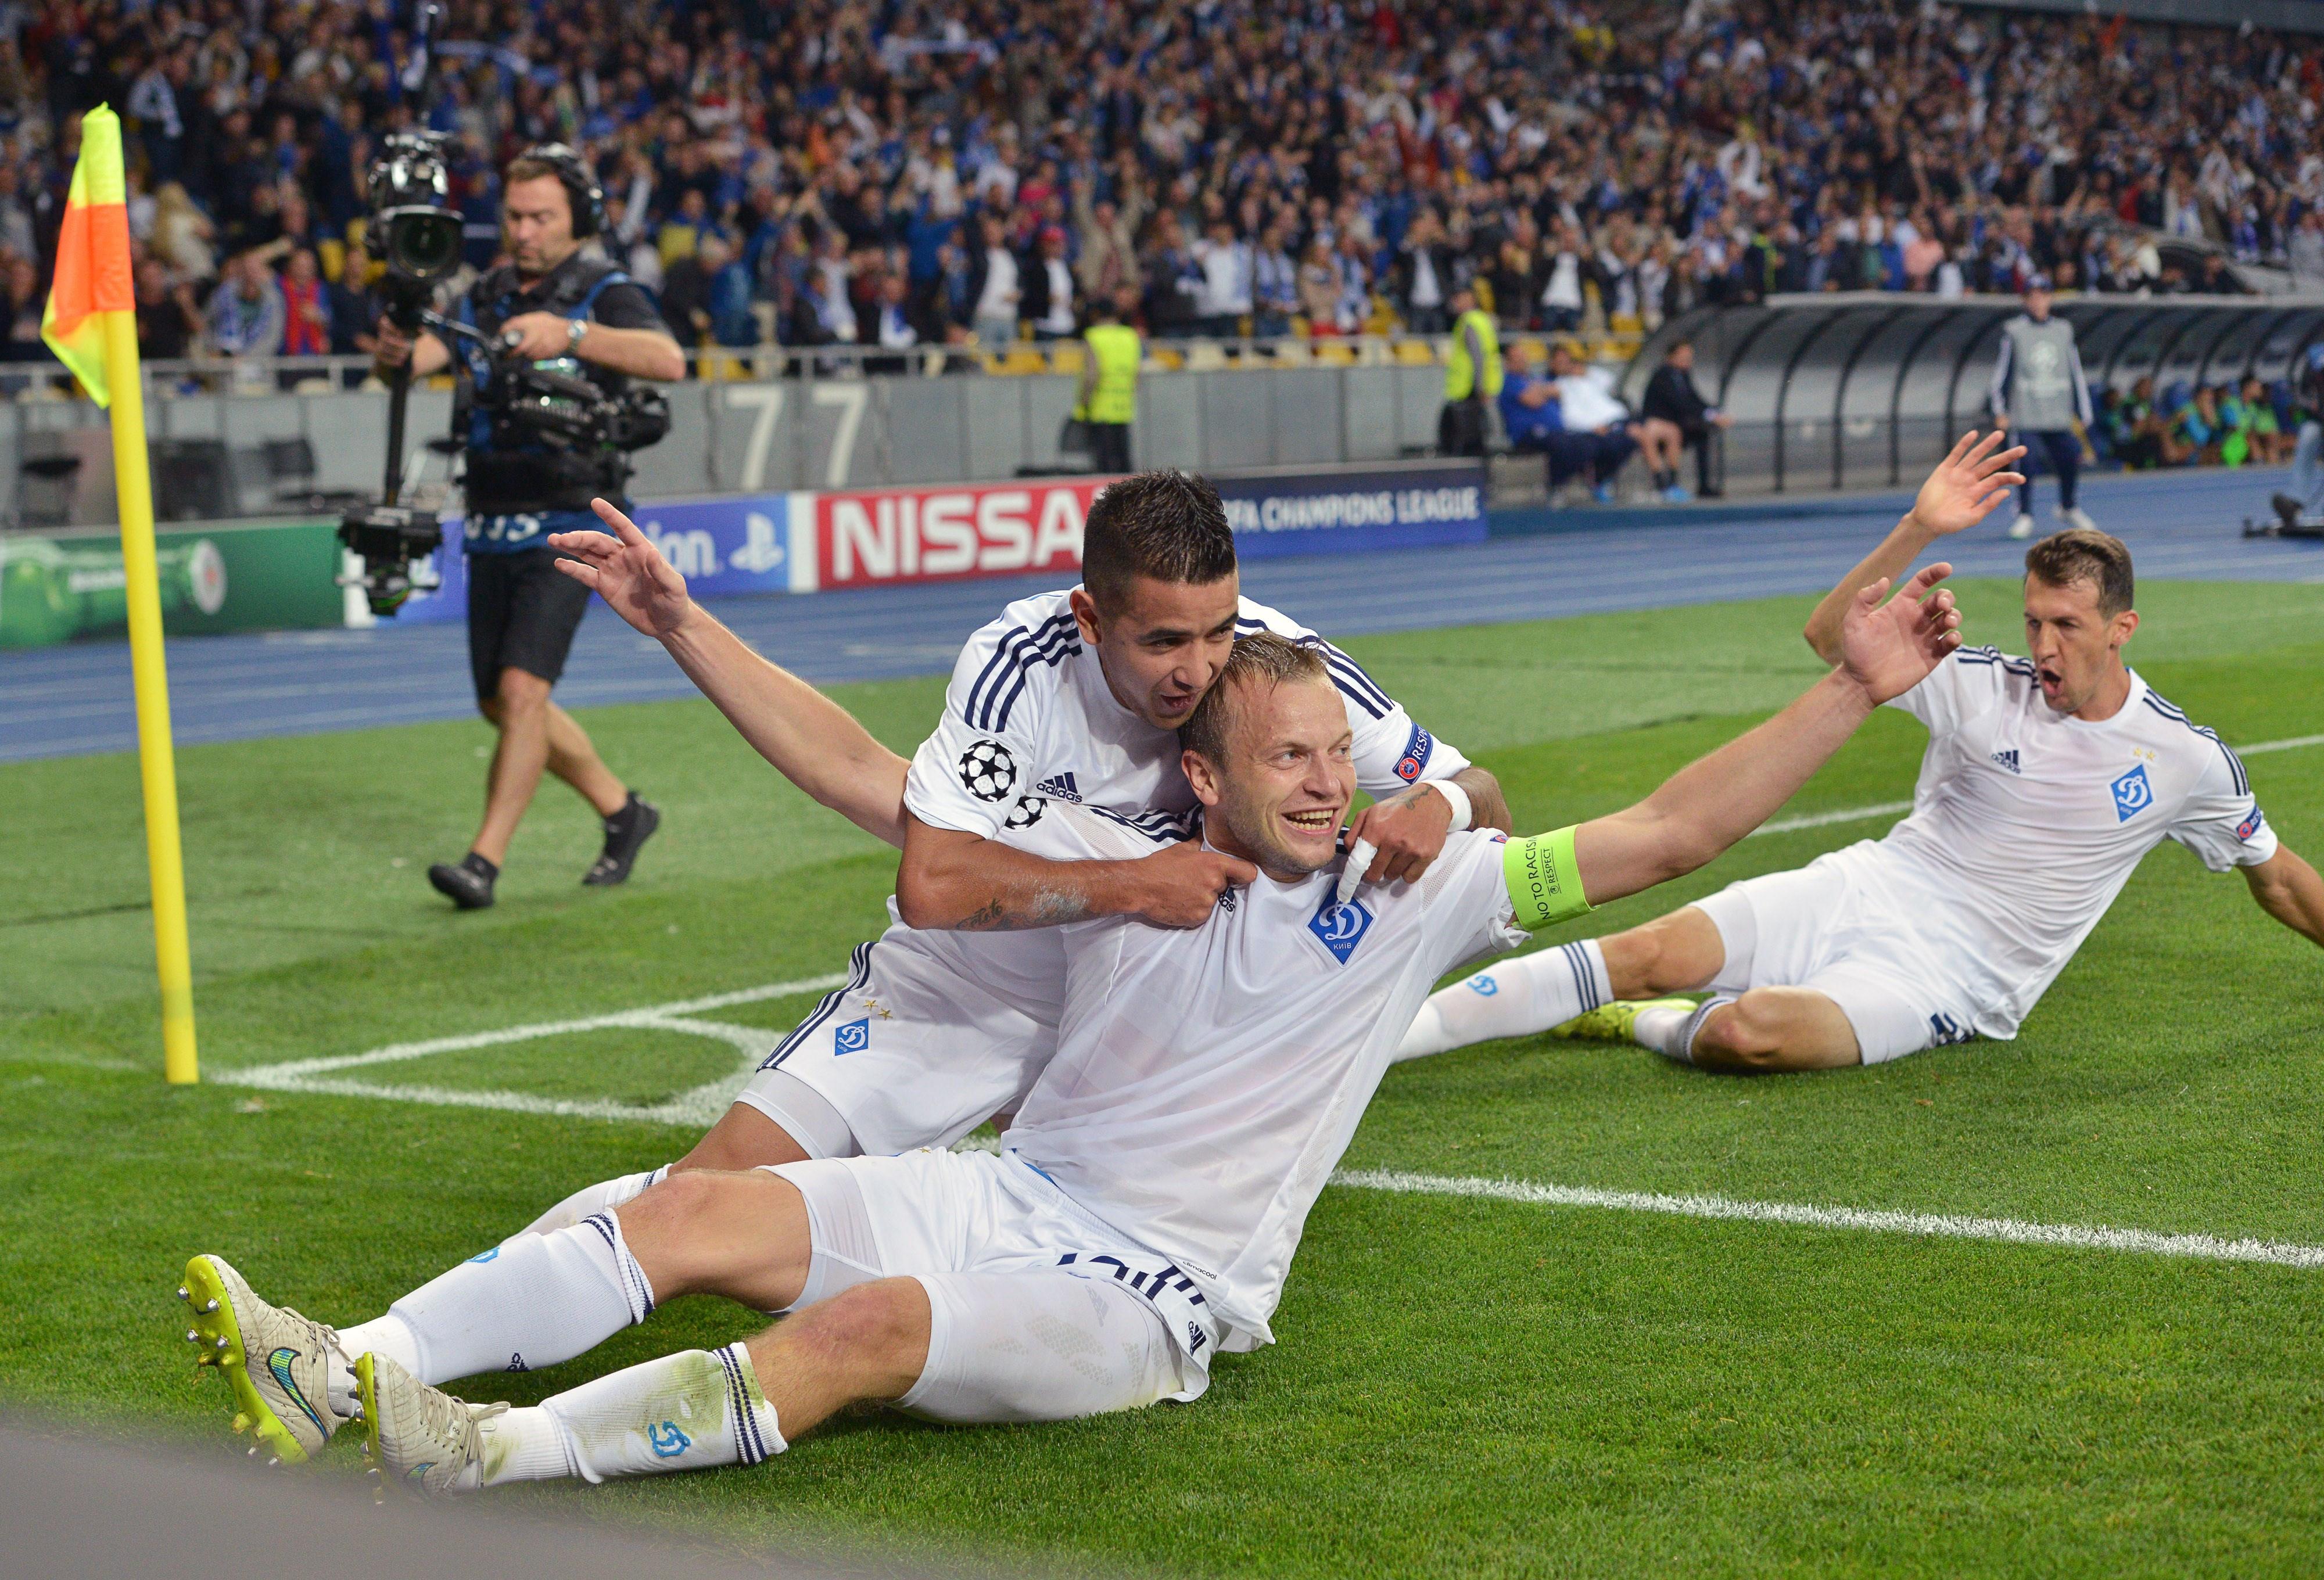 Oleh Husev leads Kyiv in UCL scoring this season. (Getty)